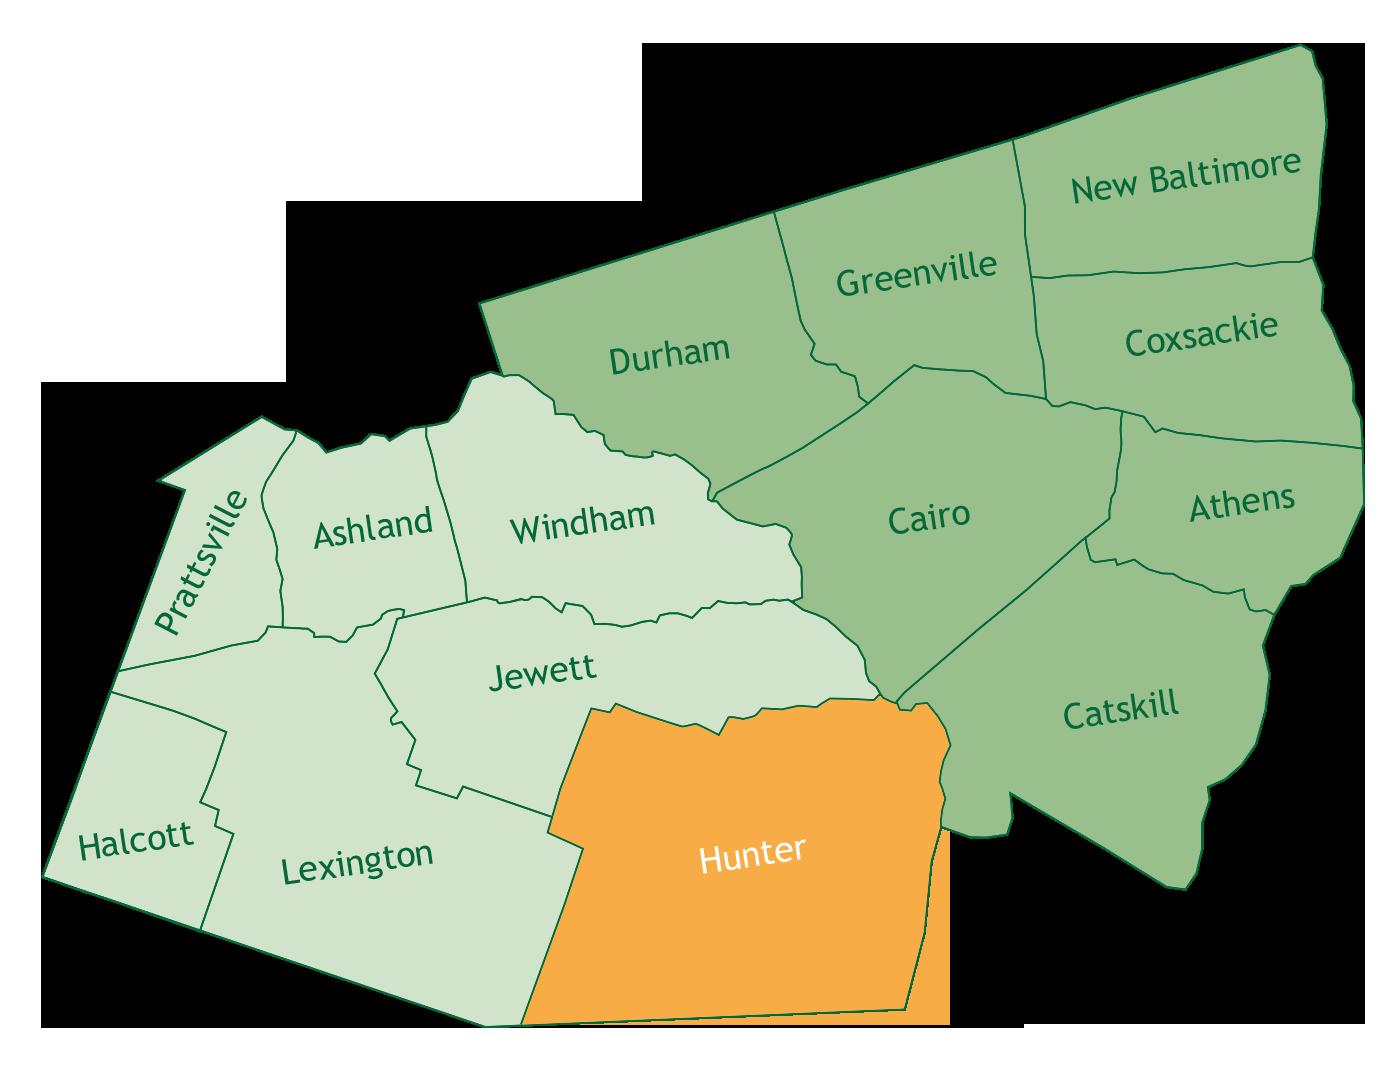 Hunter in Greene County